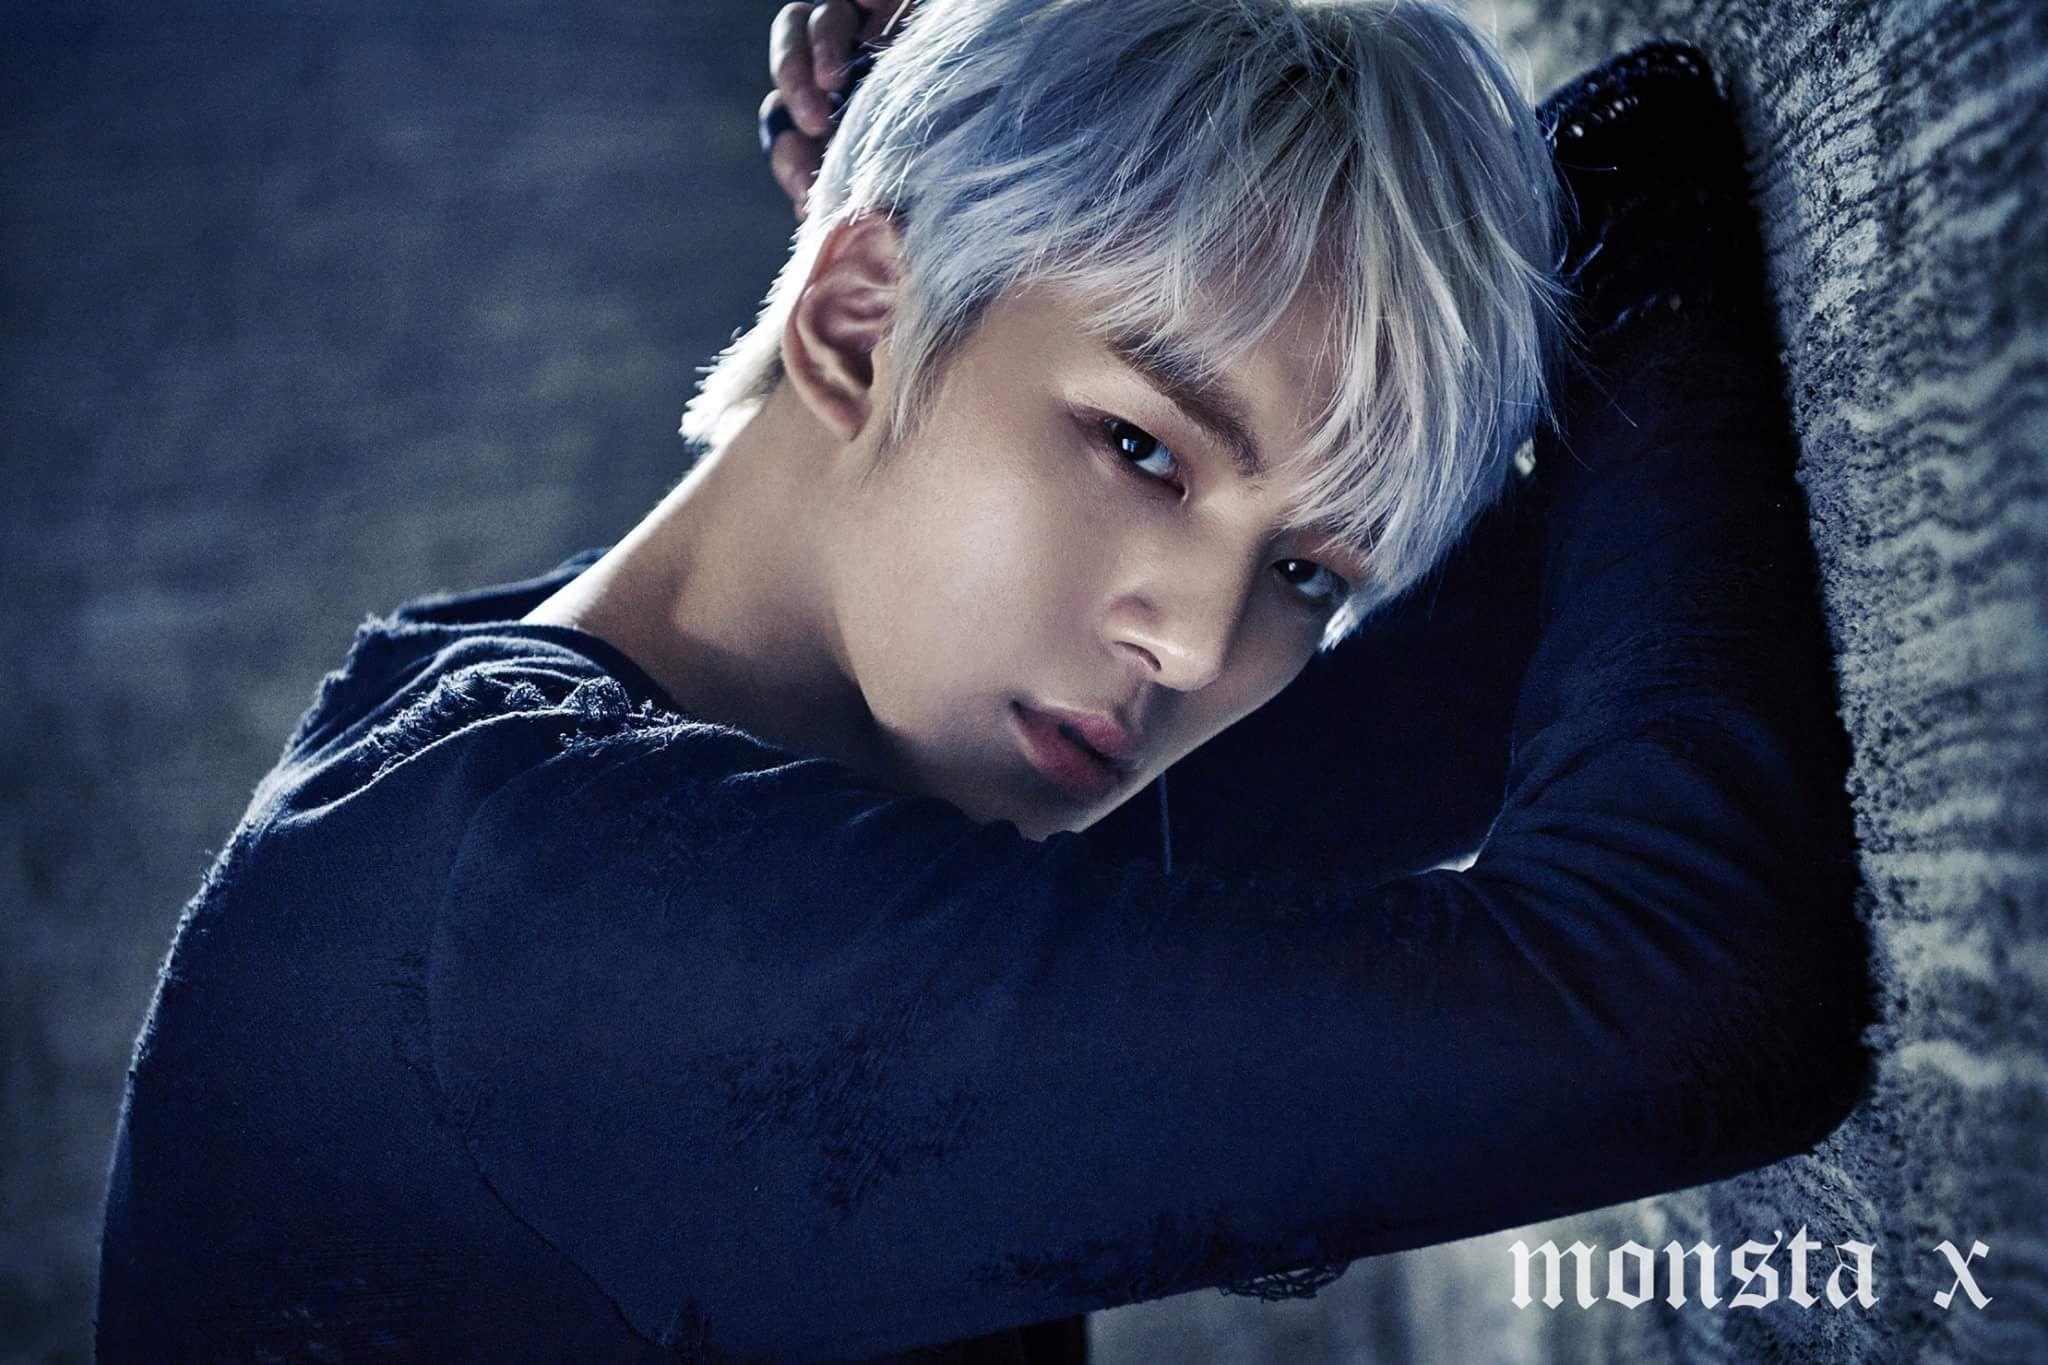 Minhyuk of Monsta X, Stuck Teaser Image | They Slay Me/Kpop